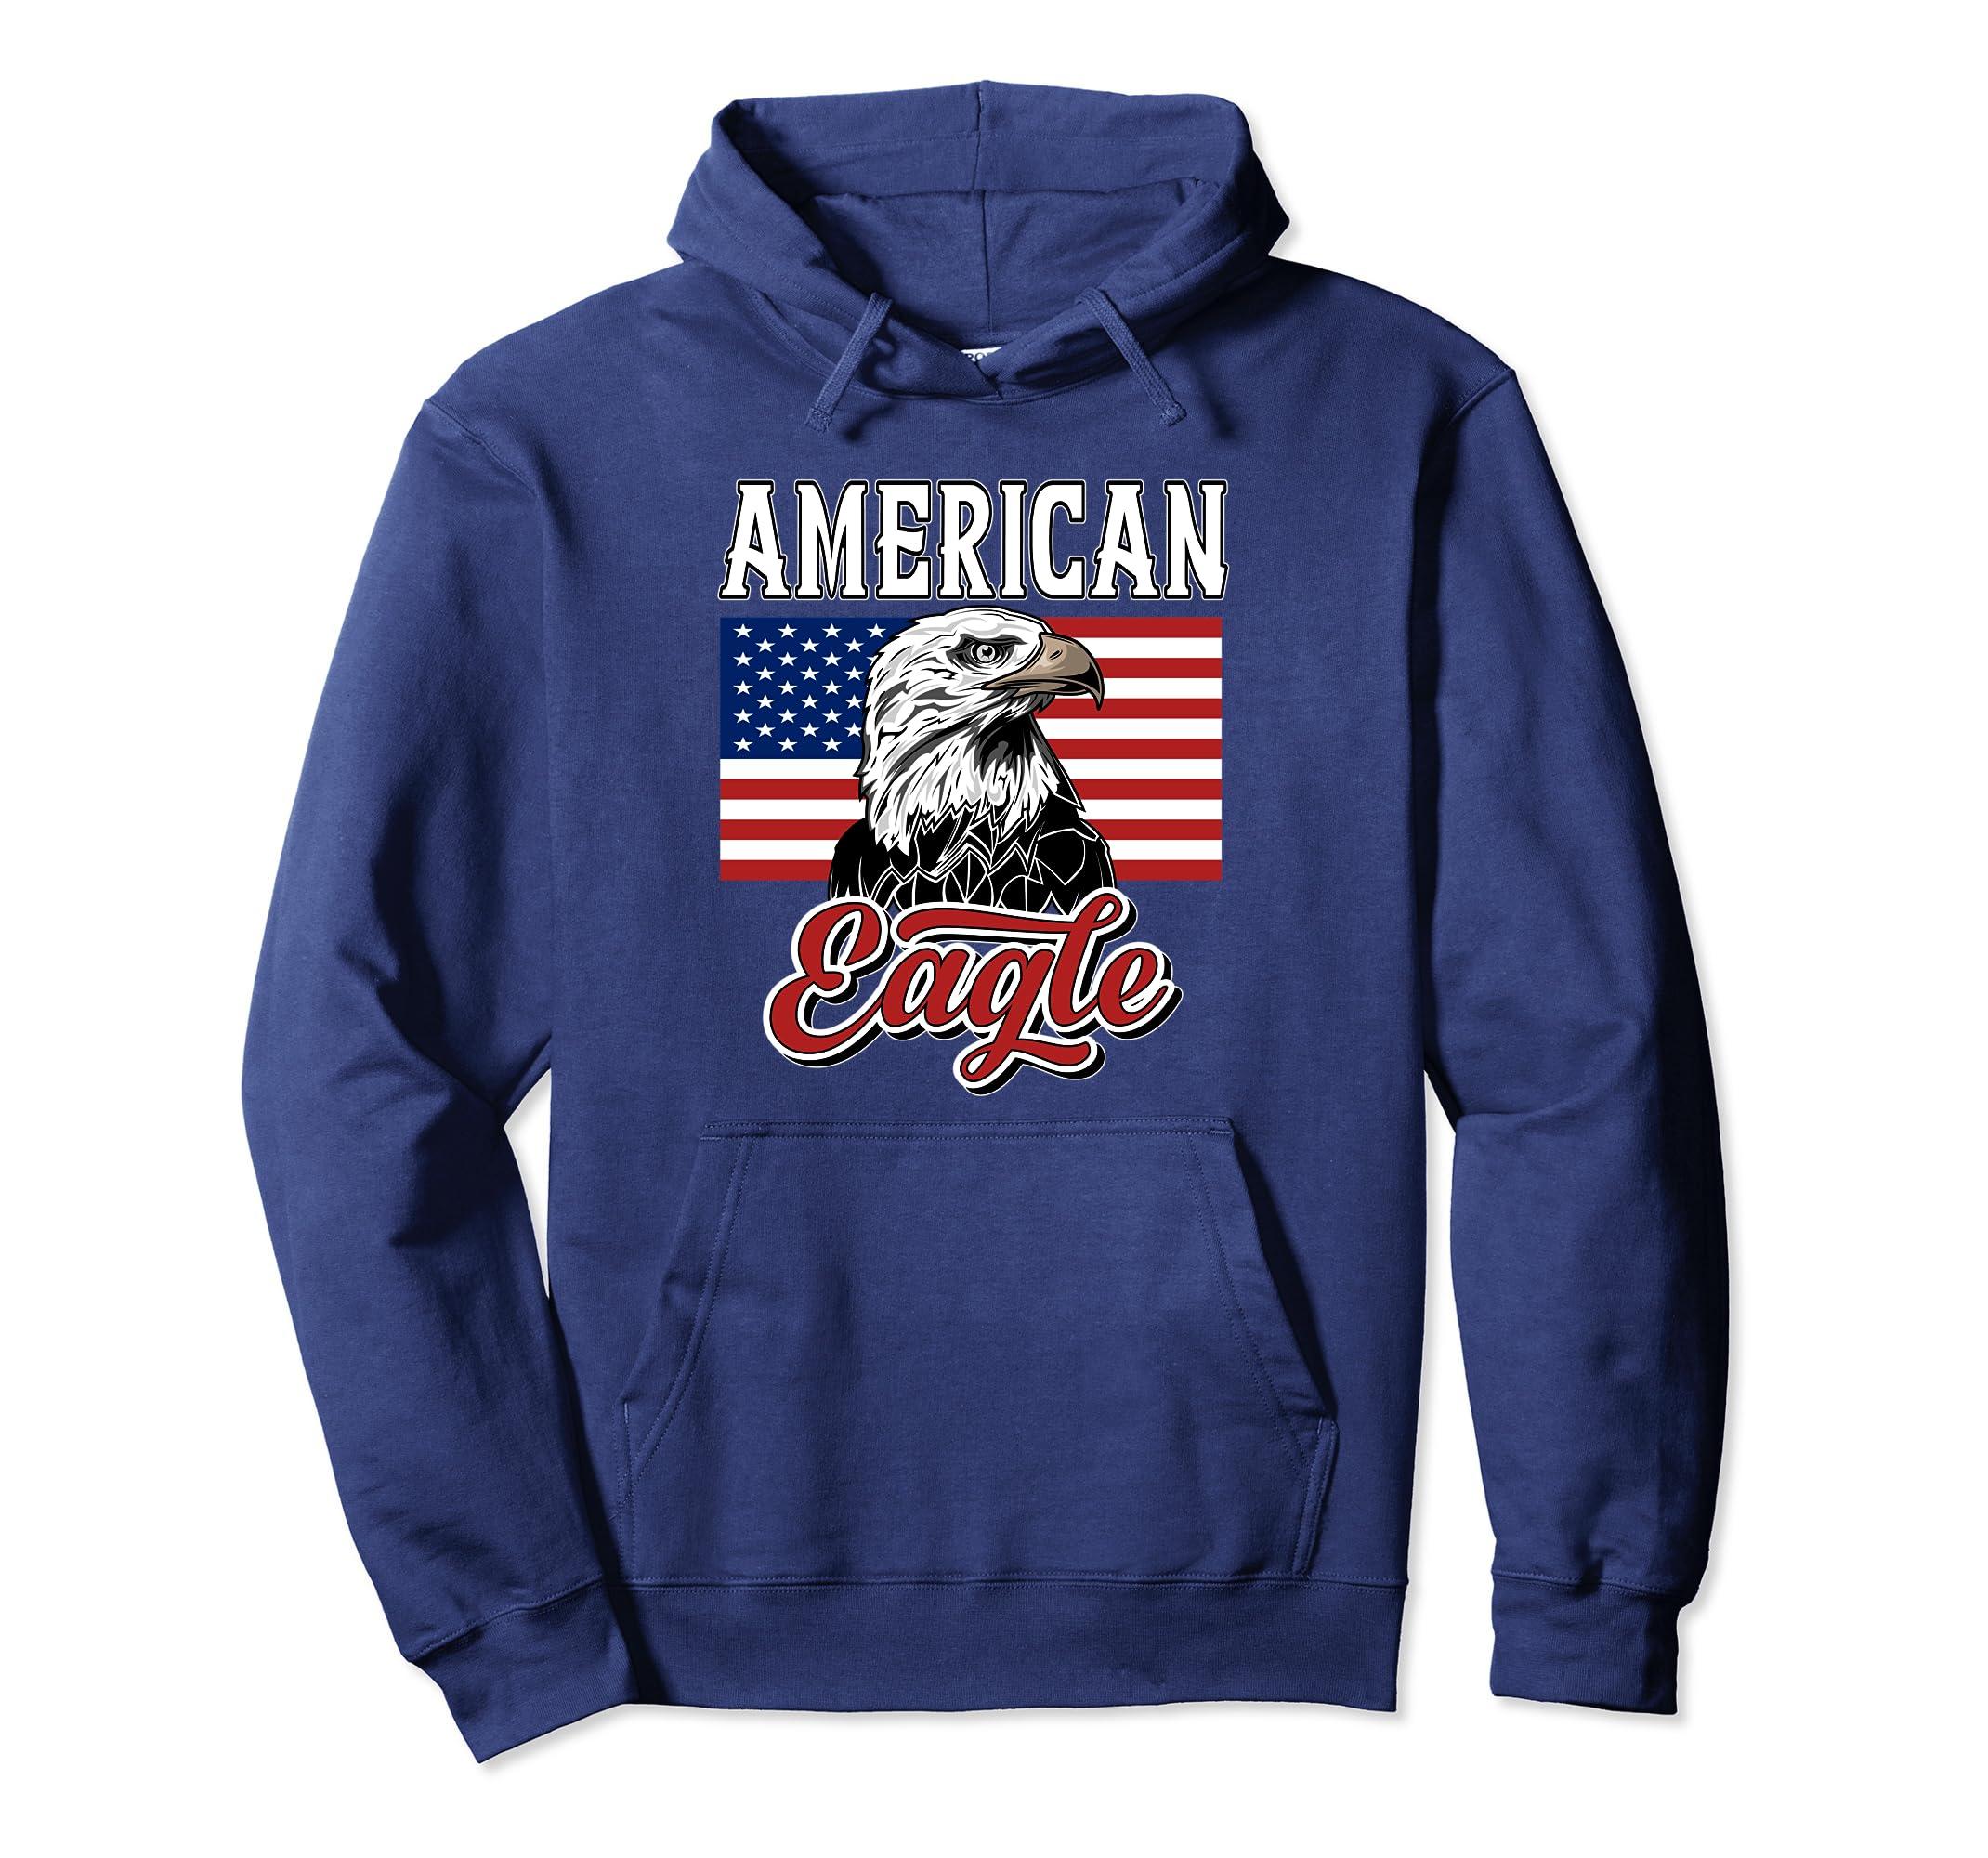 Amazon.com American Eagle Hoodie Men Women Patriotic Gifts